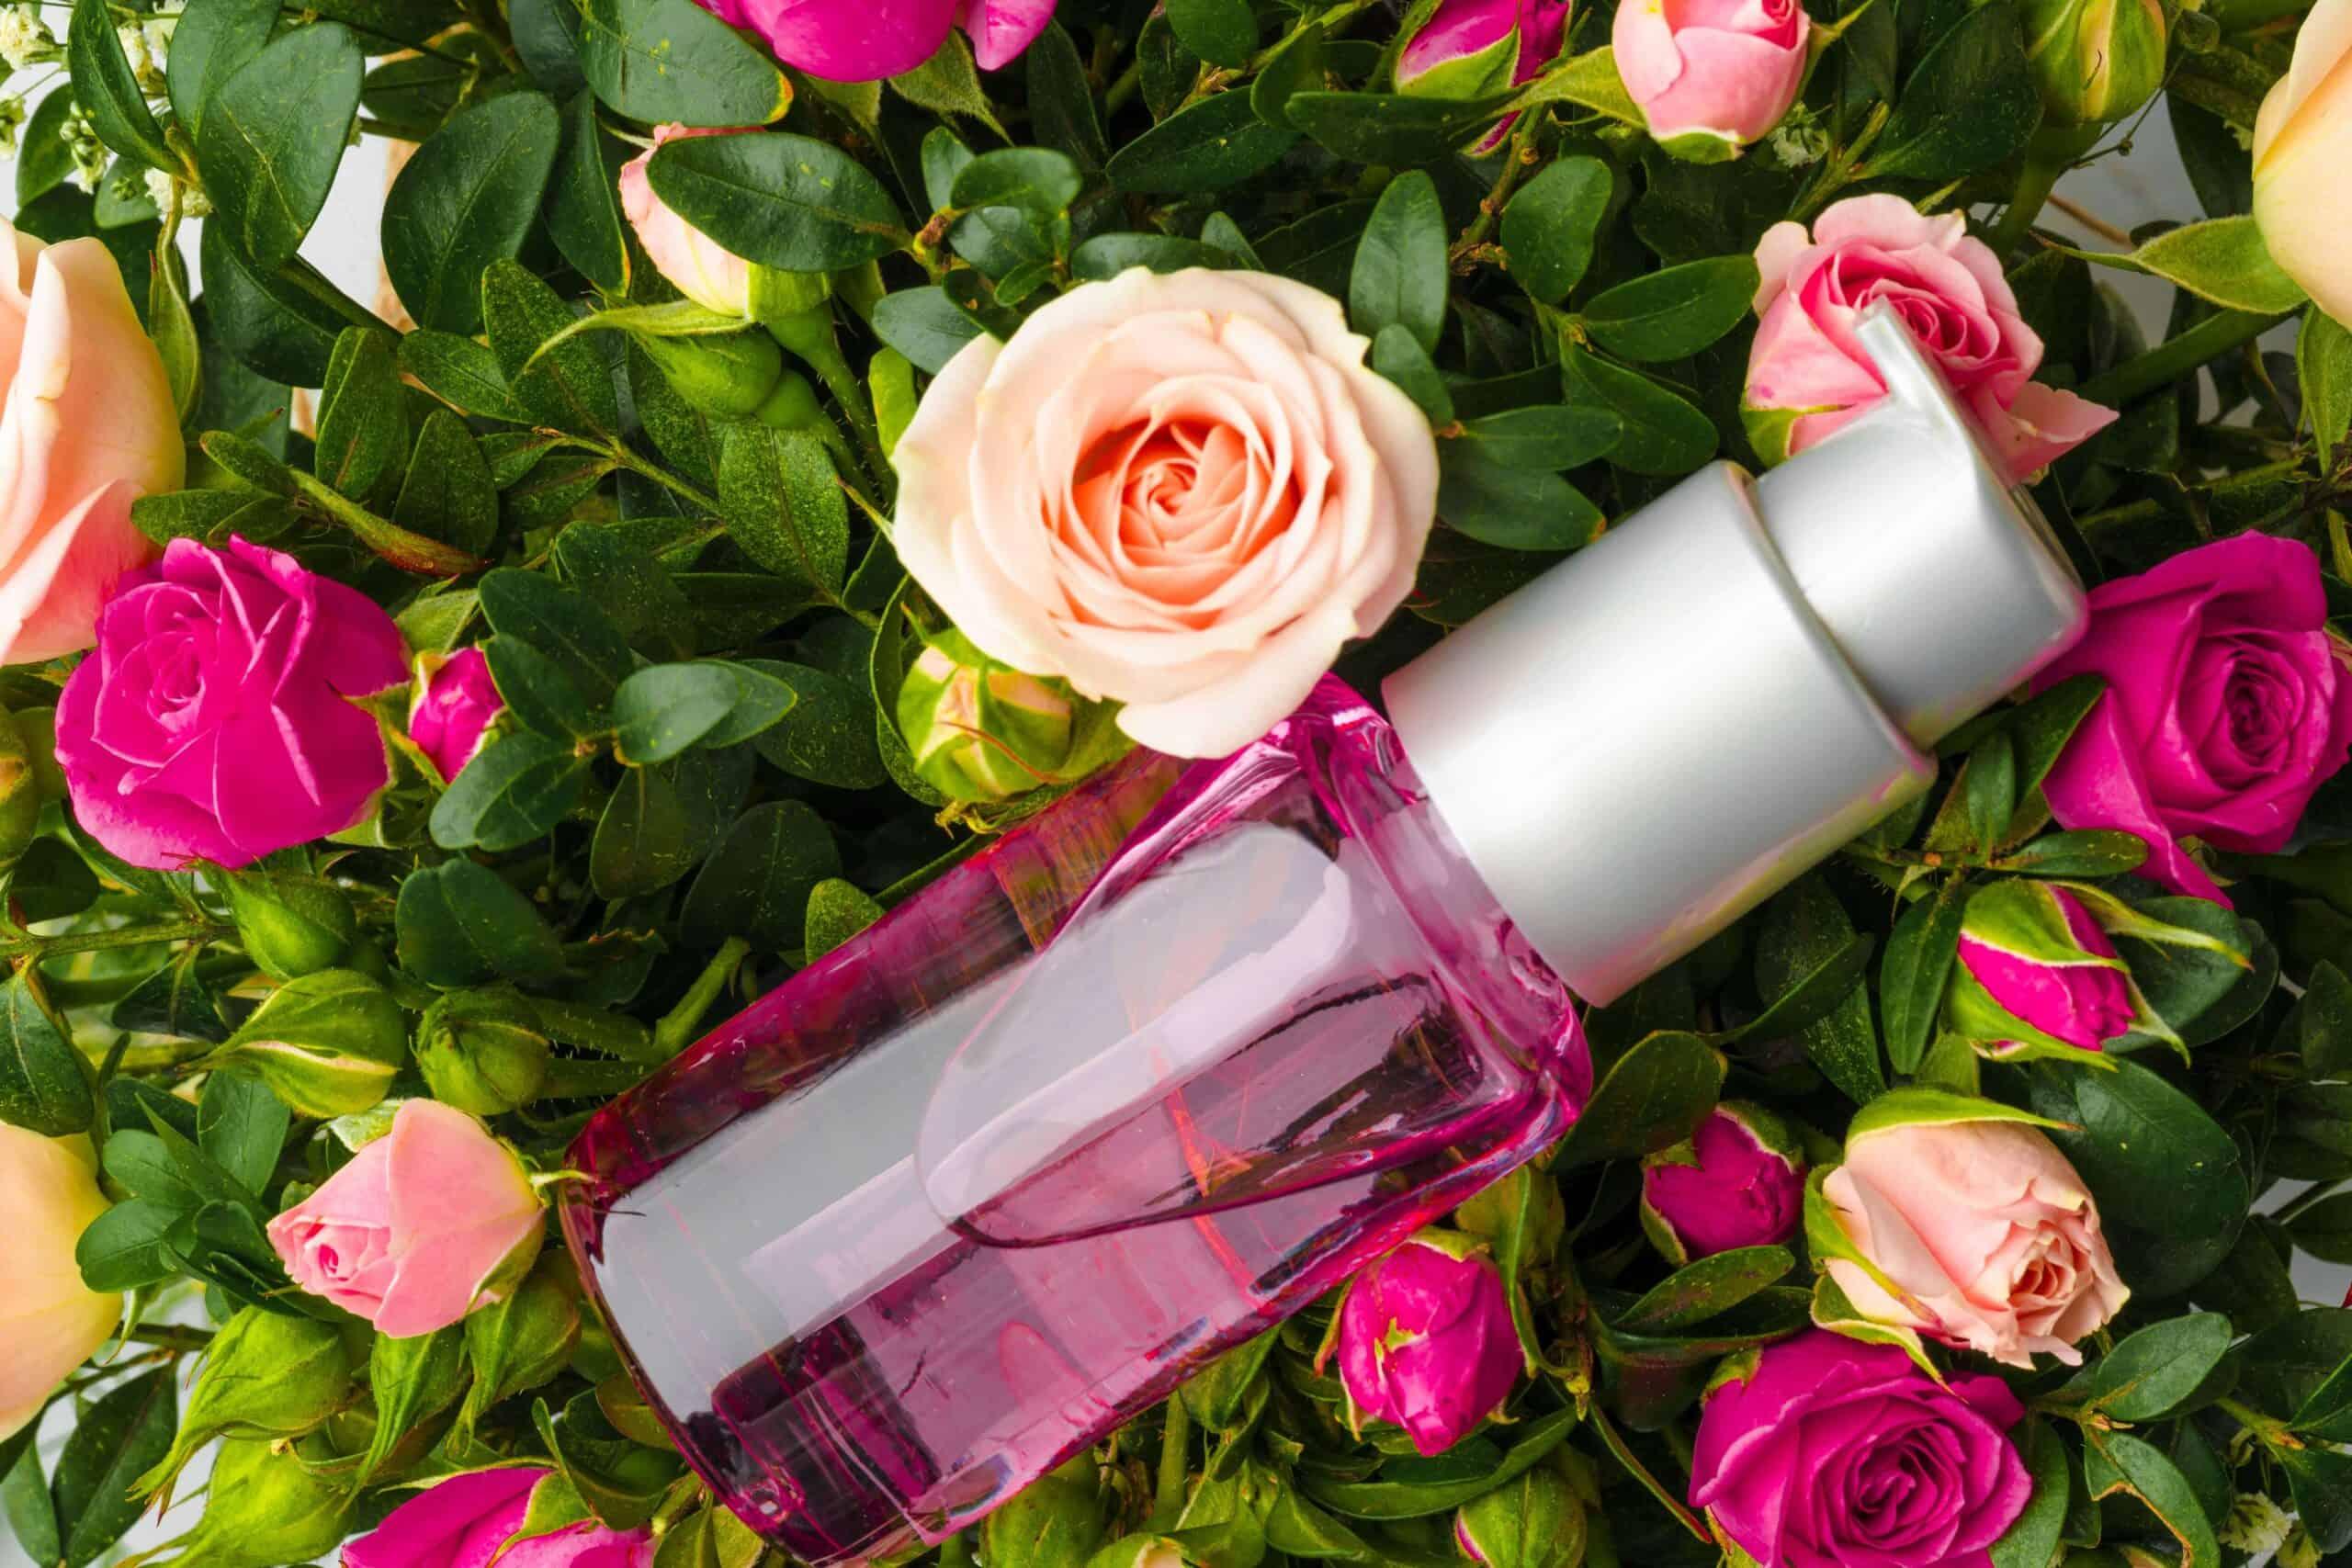 bottle-of-fragrance-or-aromatic-oil-in-a-bunch-of--TXH3HWL-min